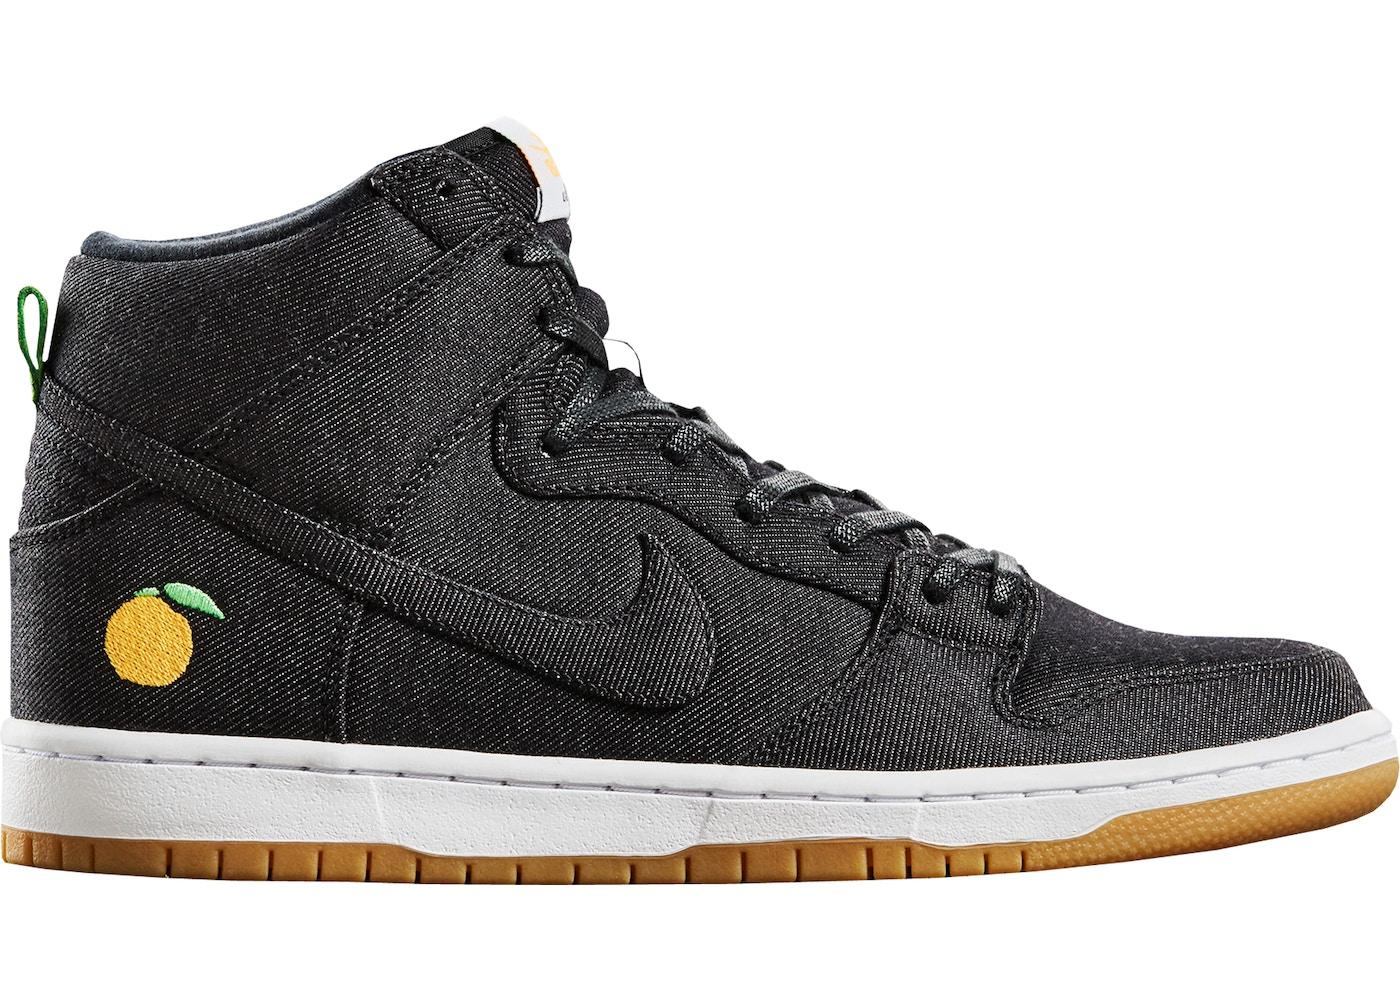 sports shoes 50a10 08331 ... Nike SB Dunk High Momofuku ...